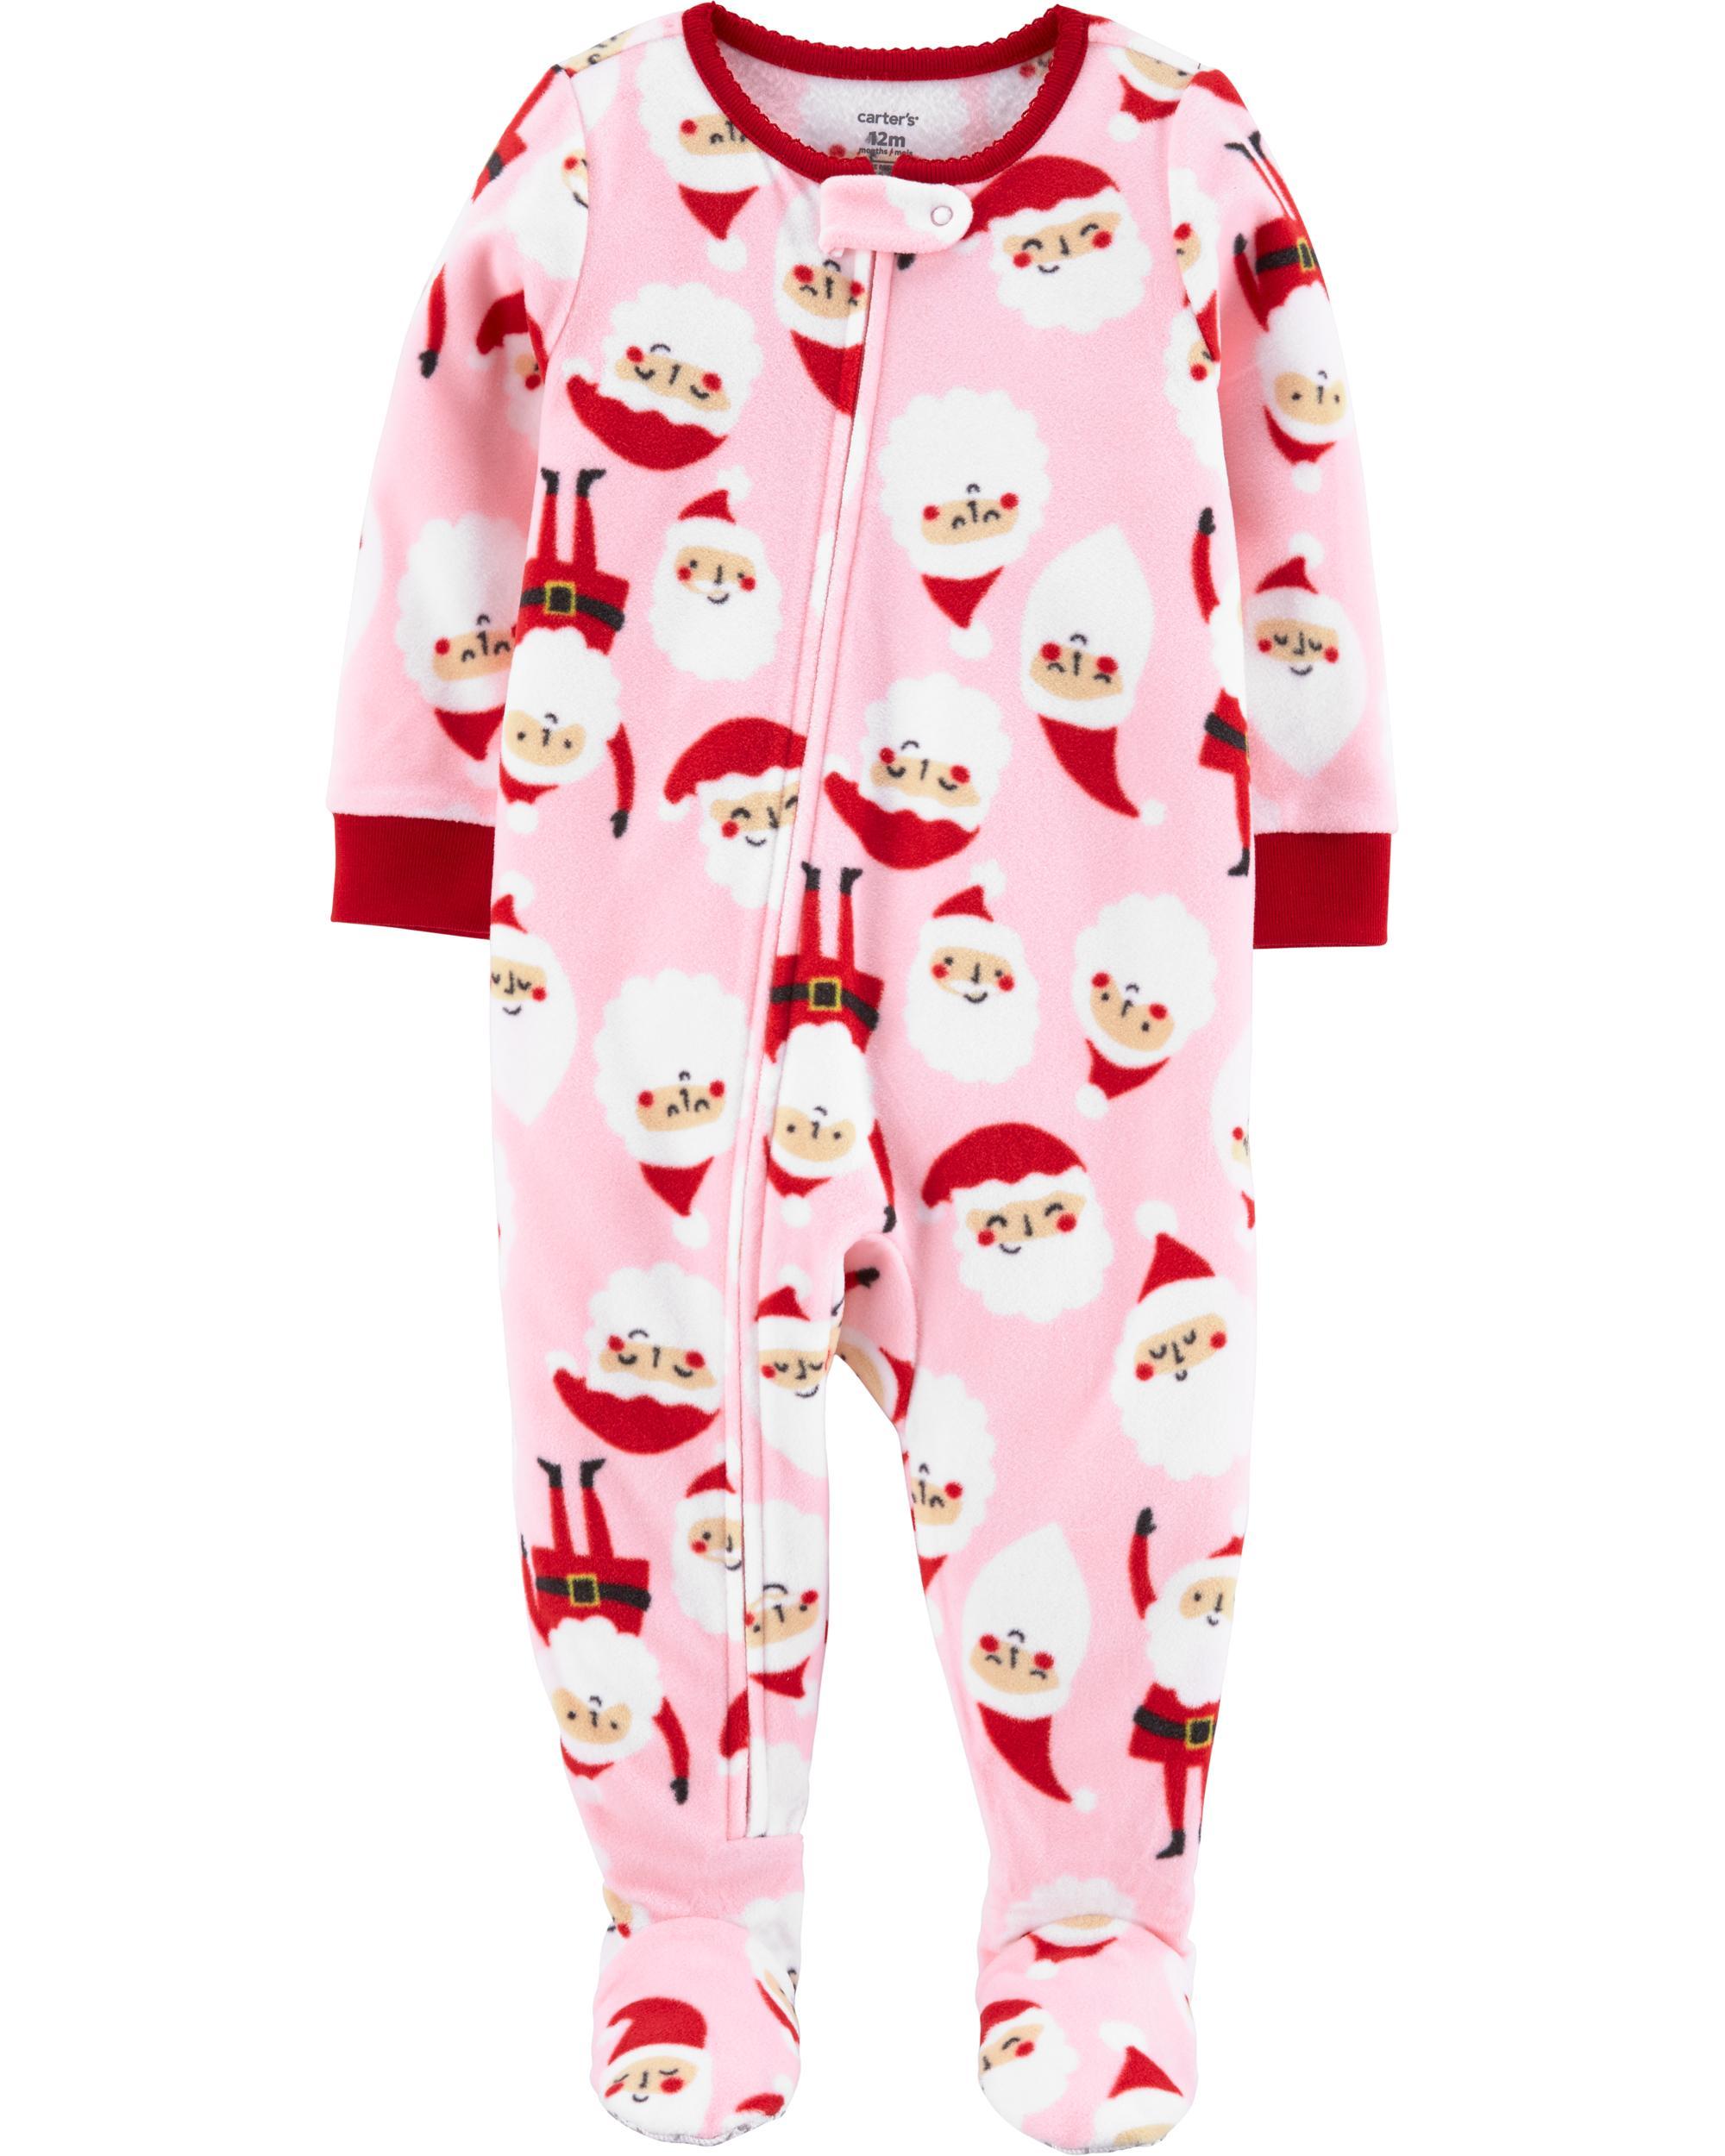 Carter/'s Baby Girls 1-Piece Footed Fleece Pajamas